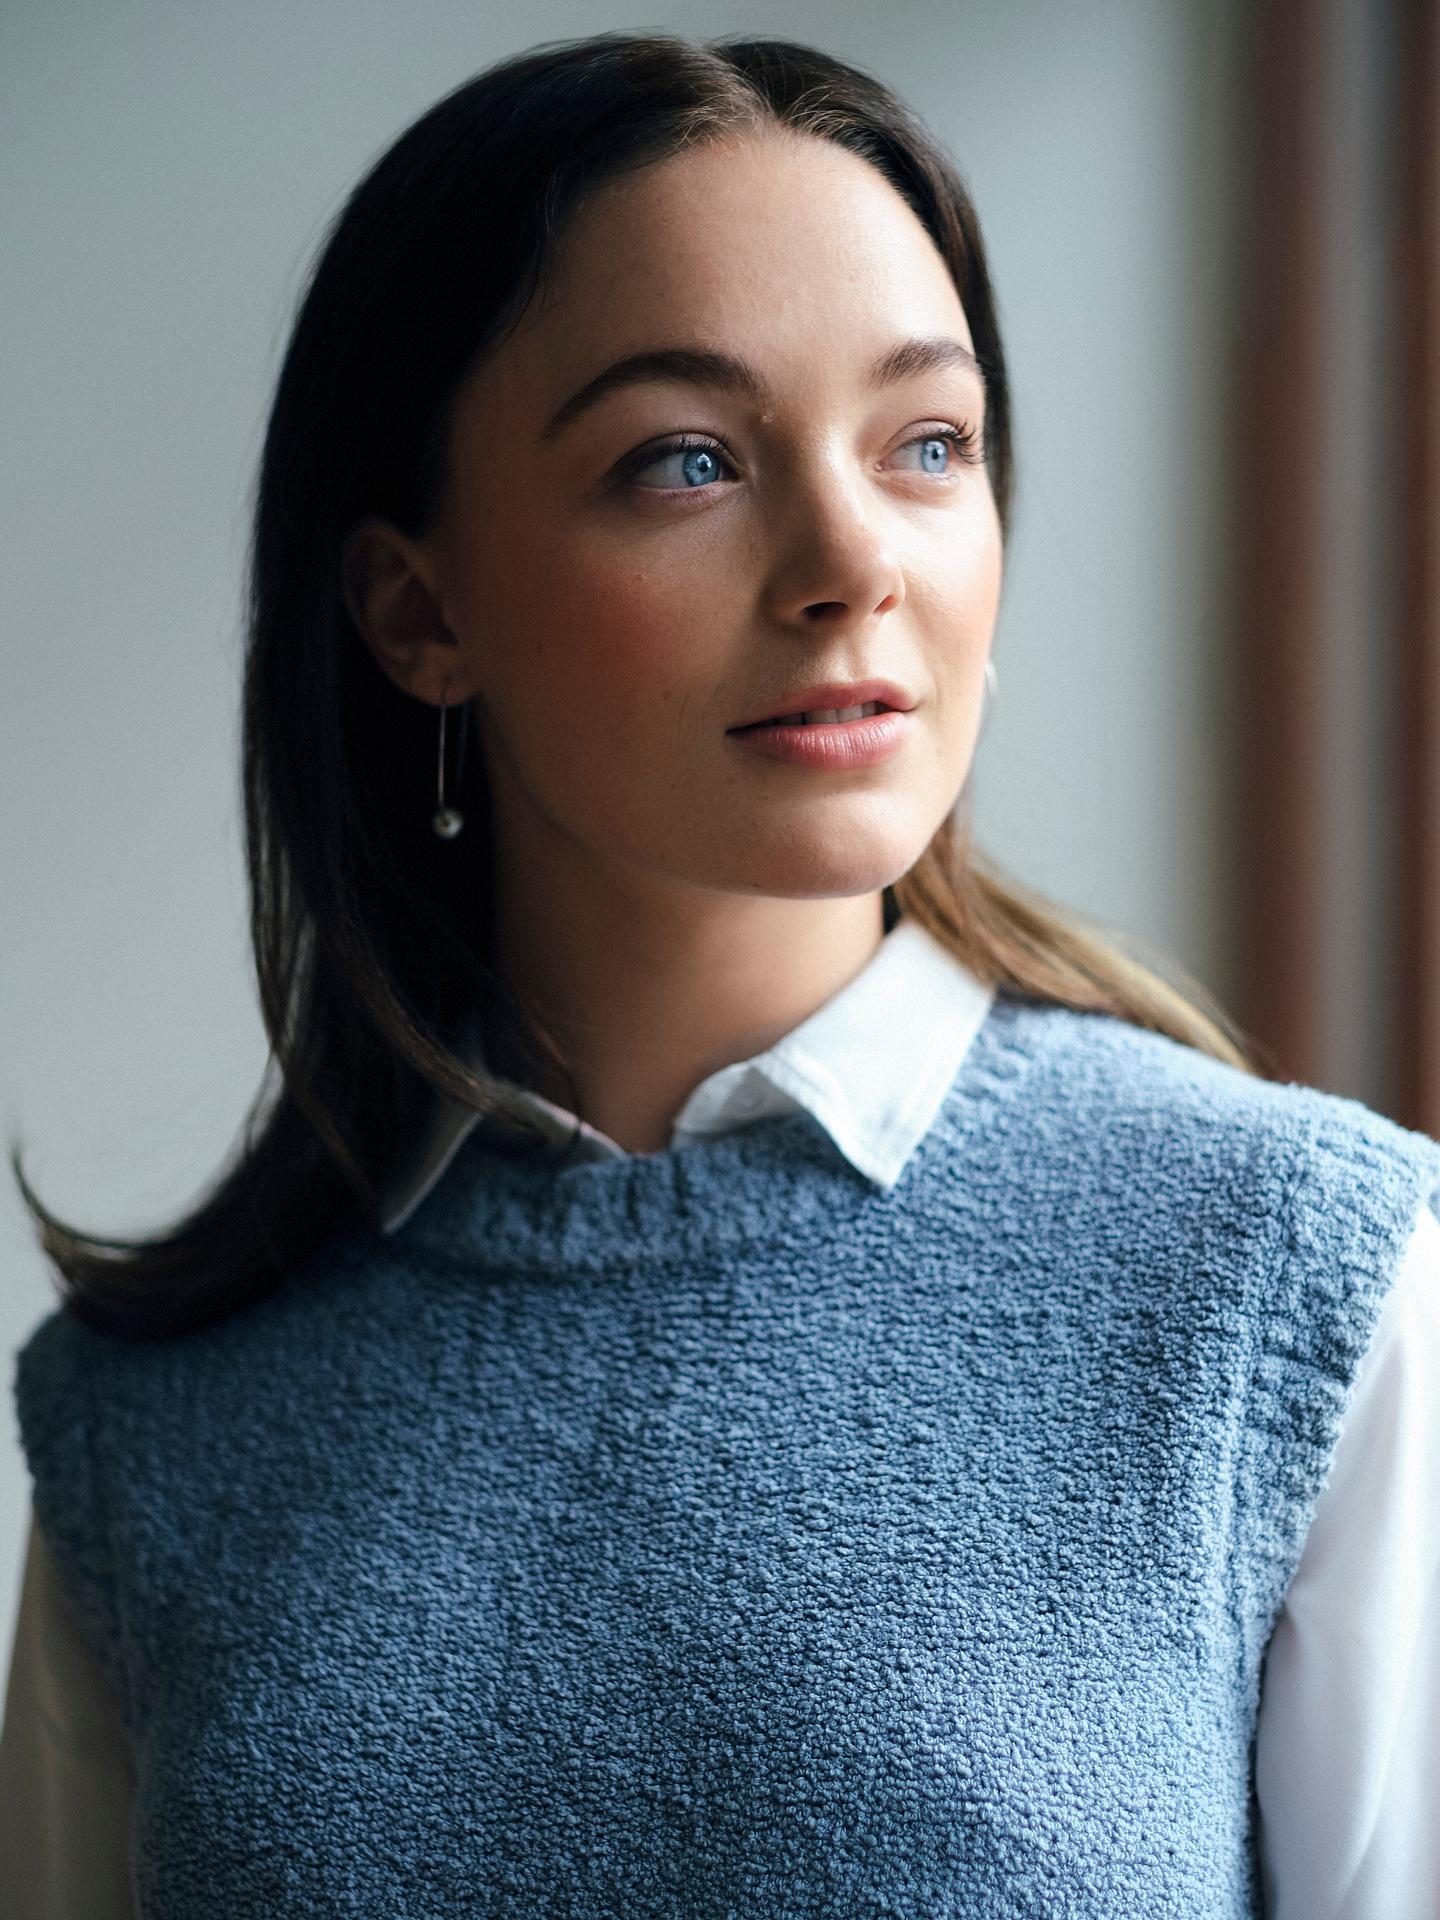 Poze Amalia Holm - Actor - Poza 5 din 9 - CineMagia.ro